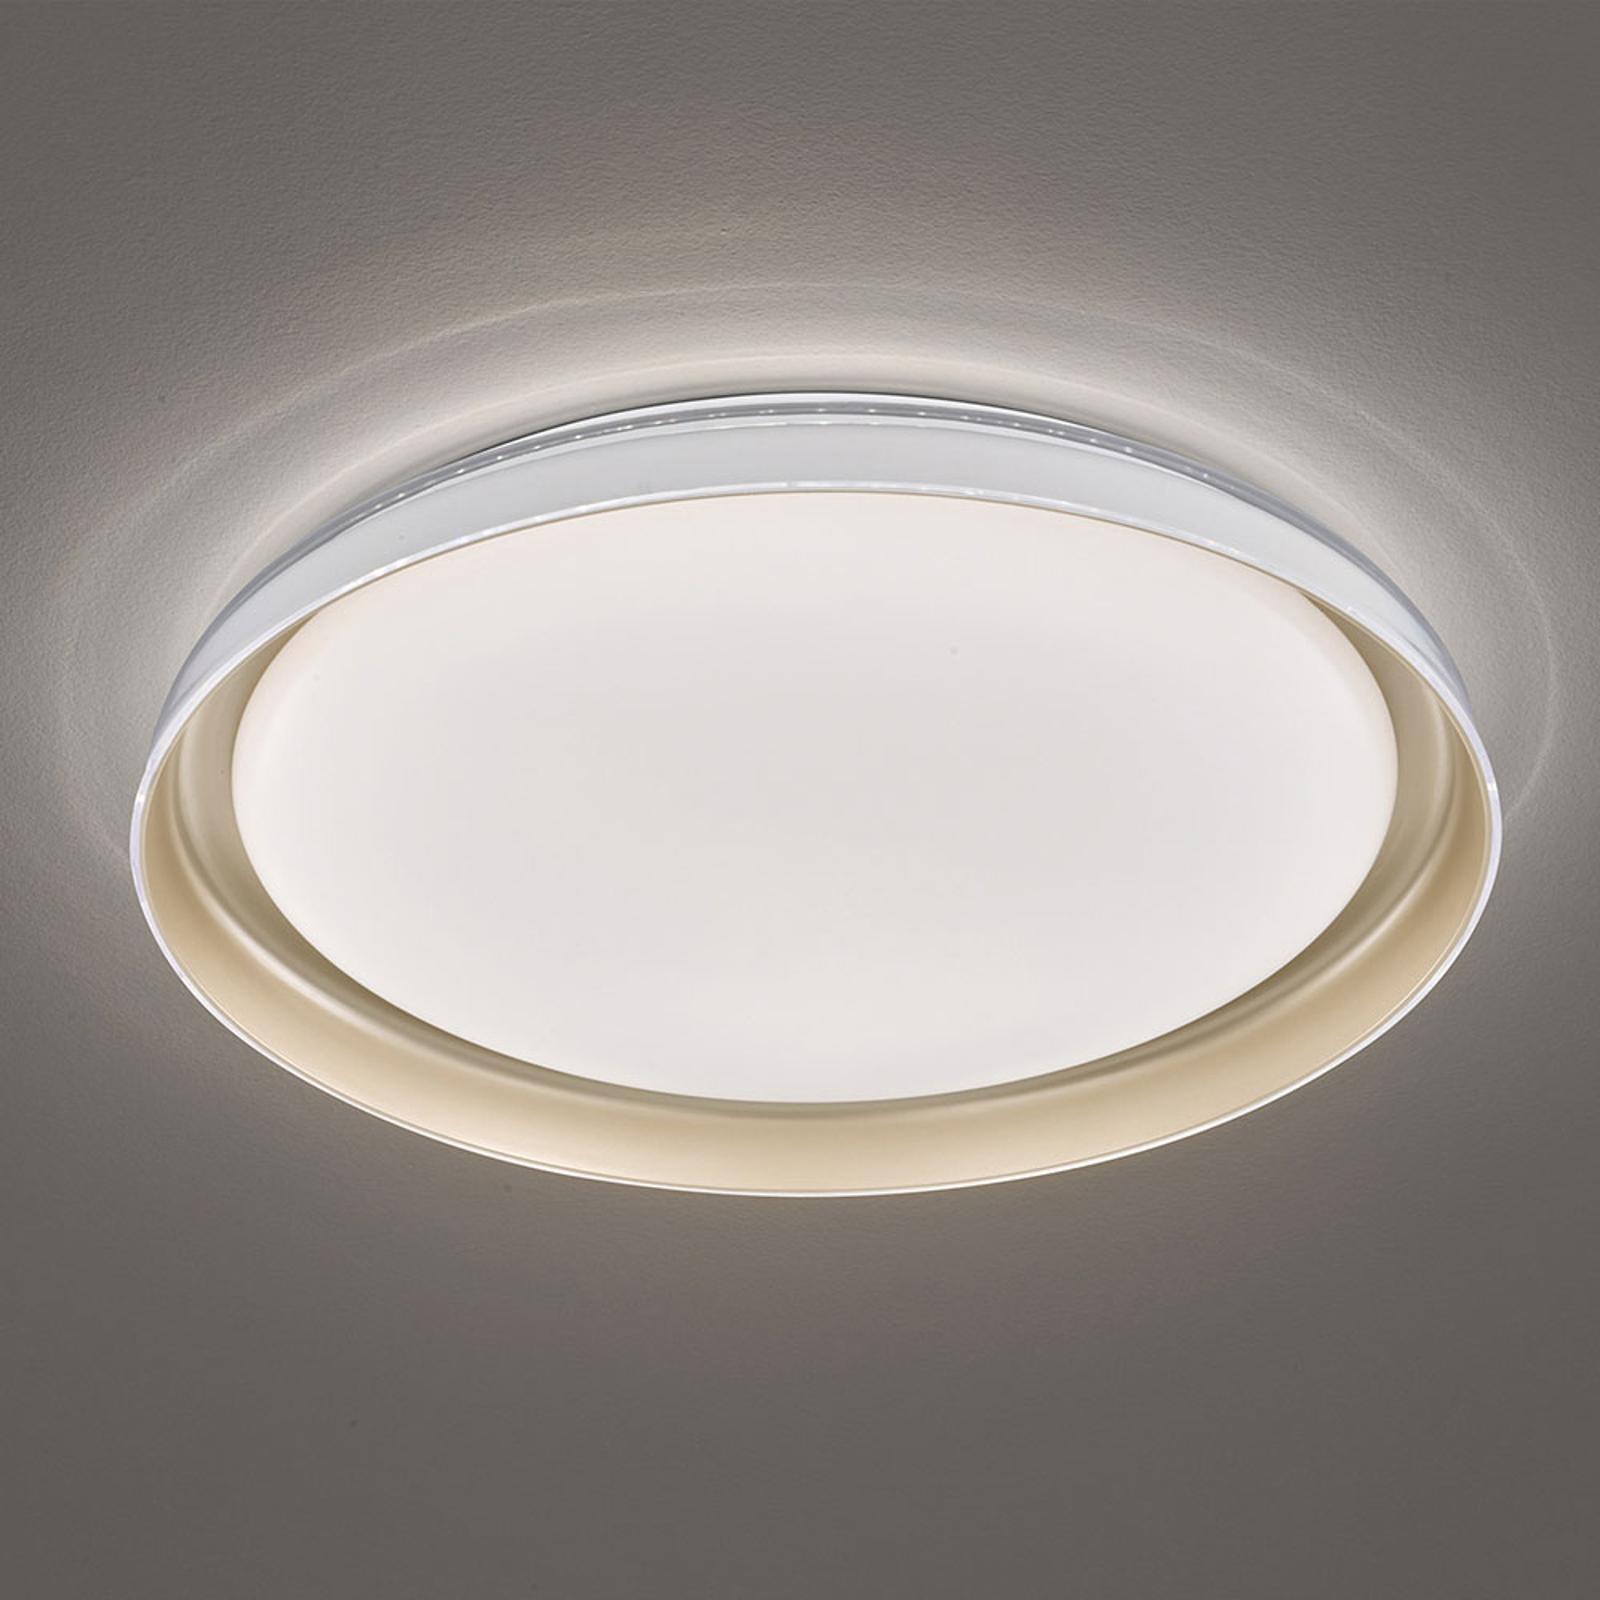 LED-Deckenleuchte Rilla, dimmbar, Ø 43cm